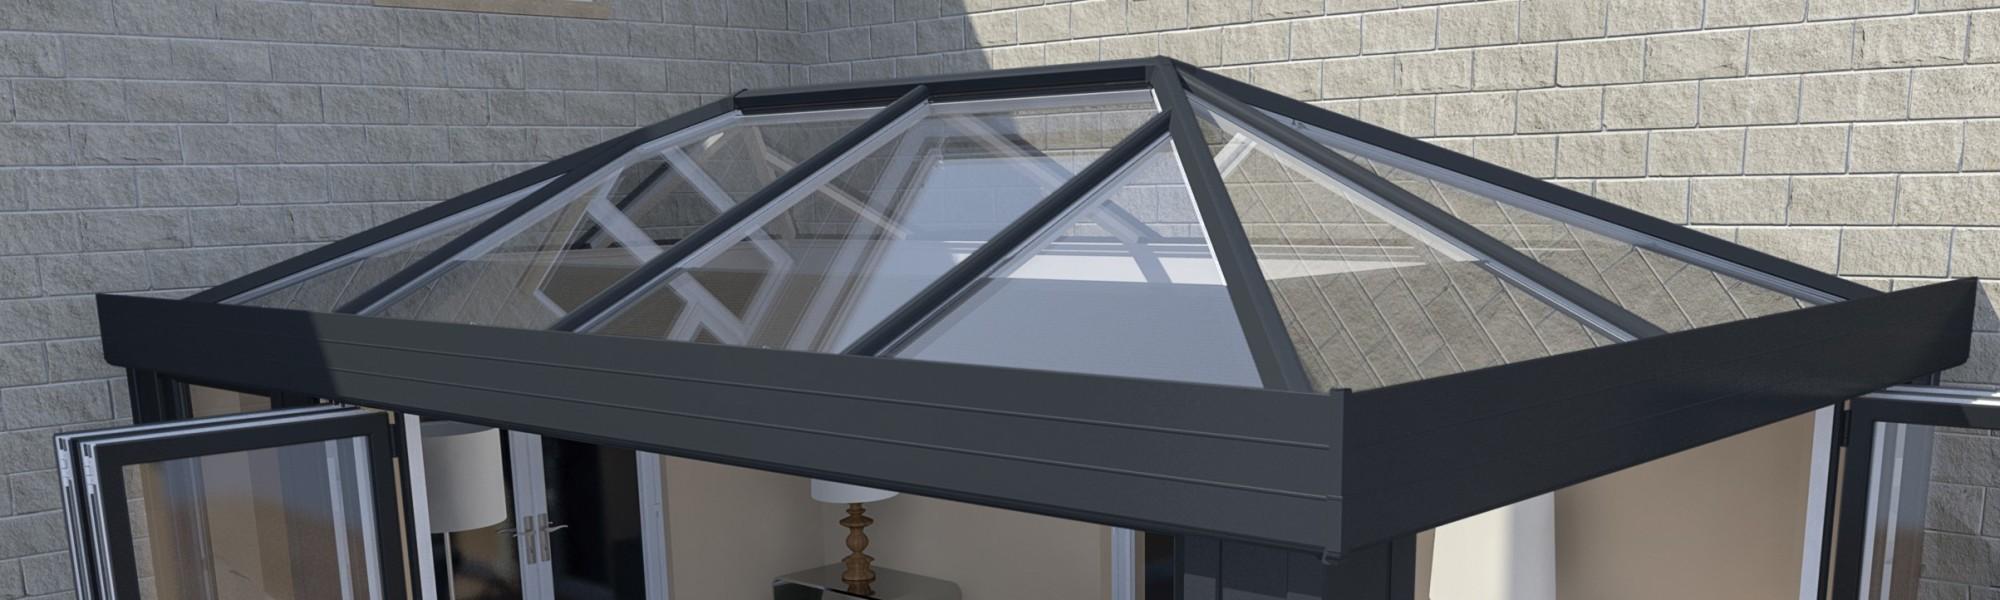 Ultrasky Roof Glass Conservatory Roofs Ultraframe